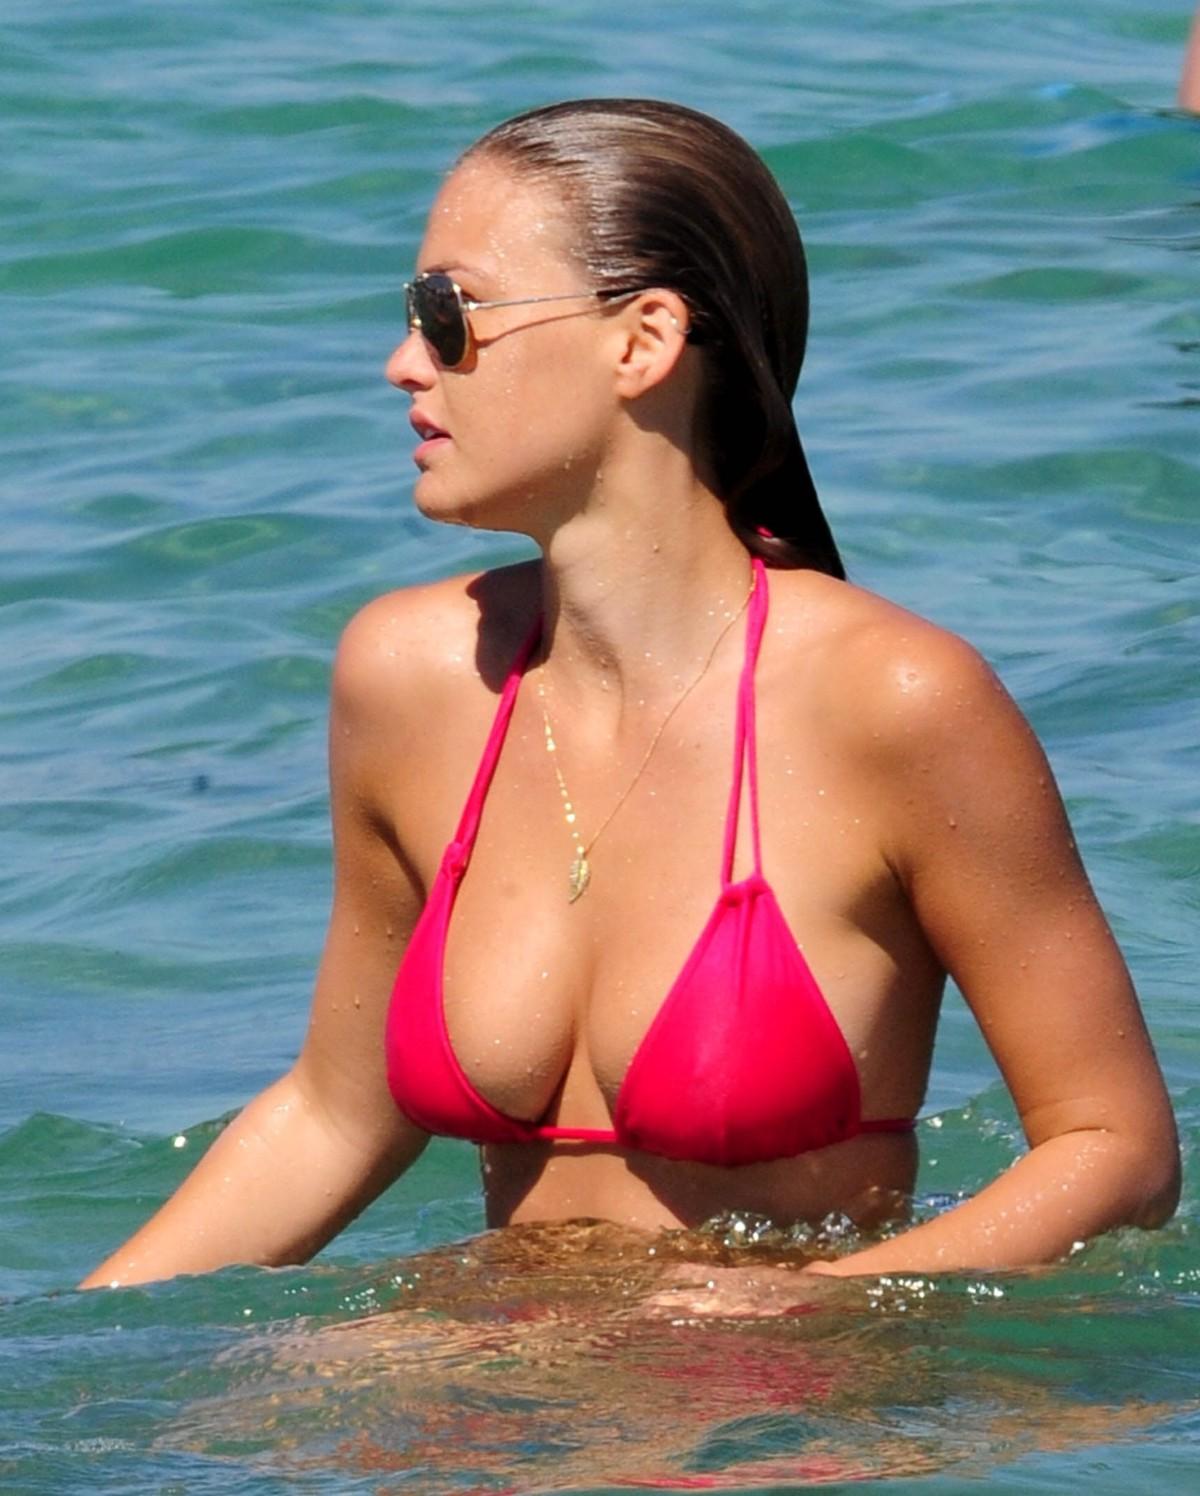 Best Bikini For Your Body Type 80